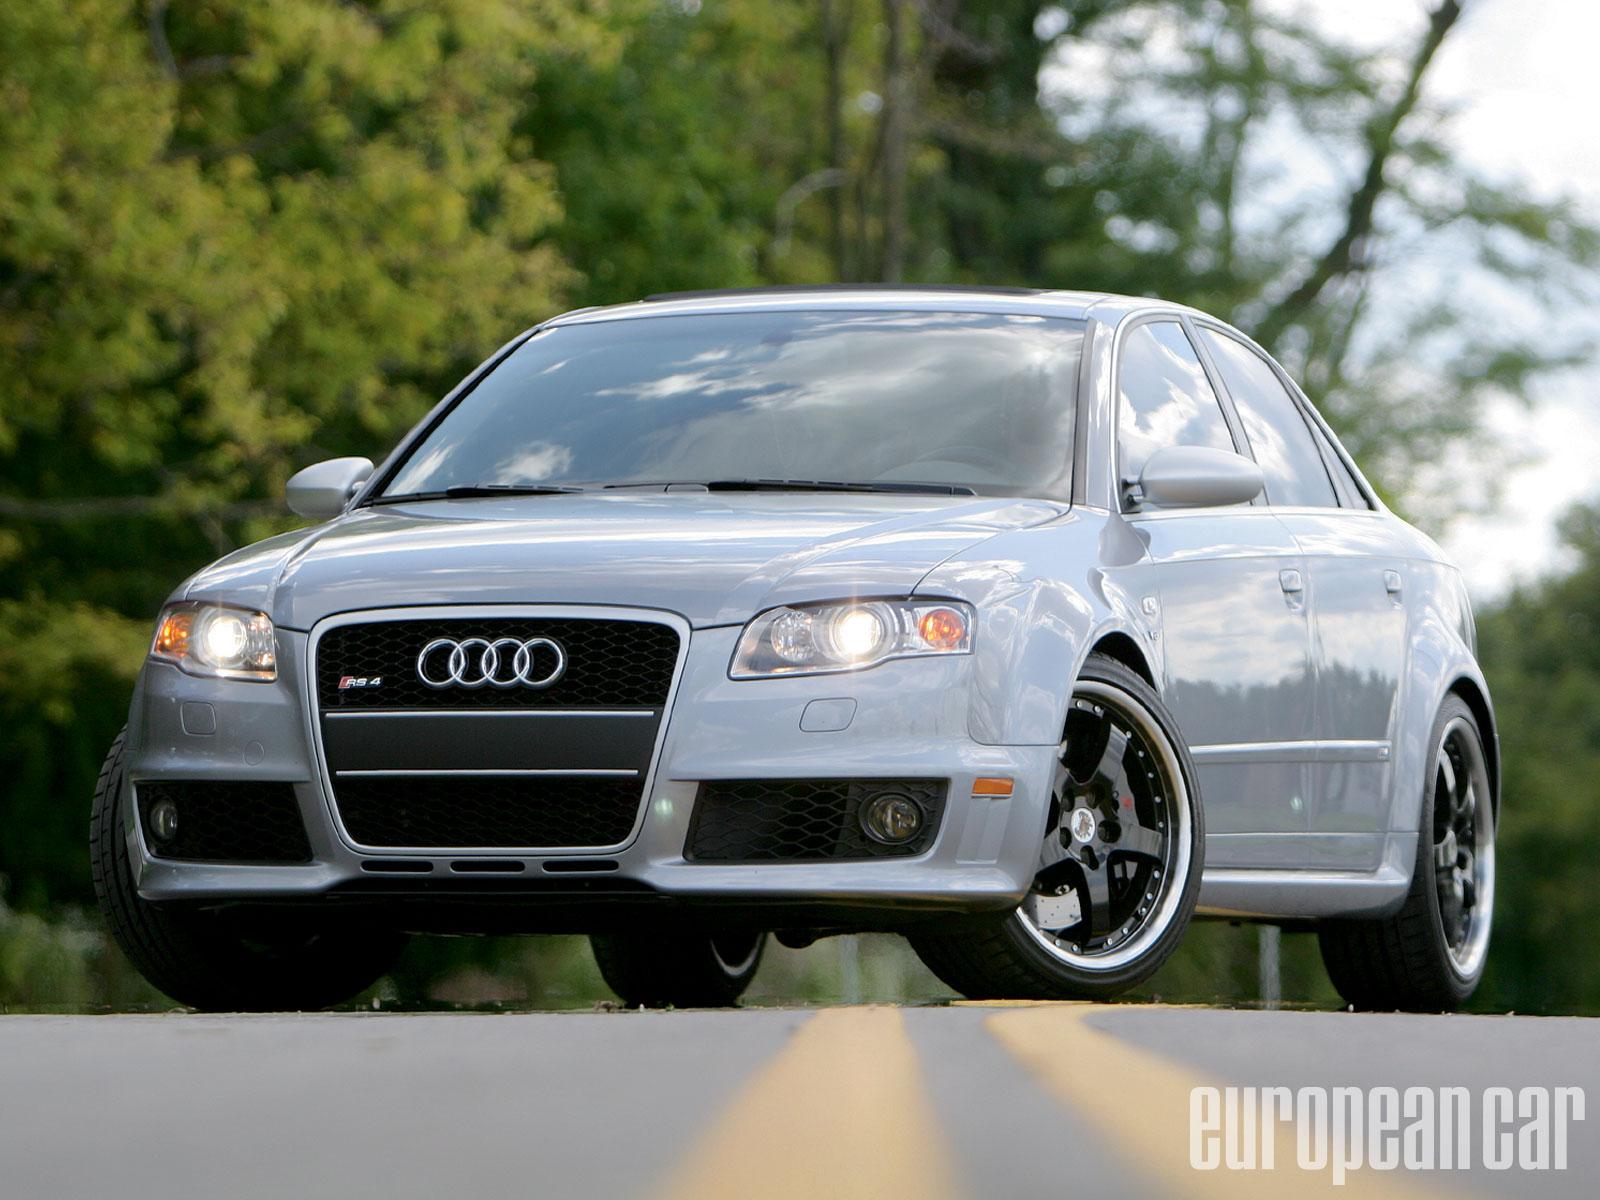 2008 Audi Rs 4 Image 12